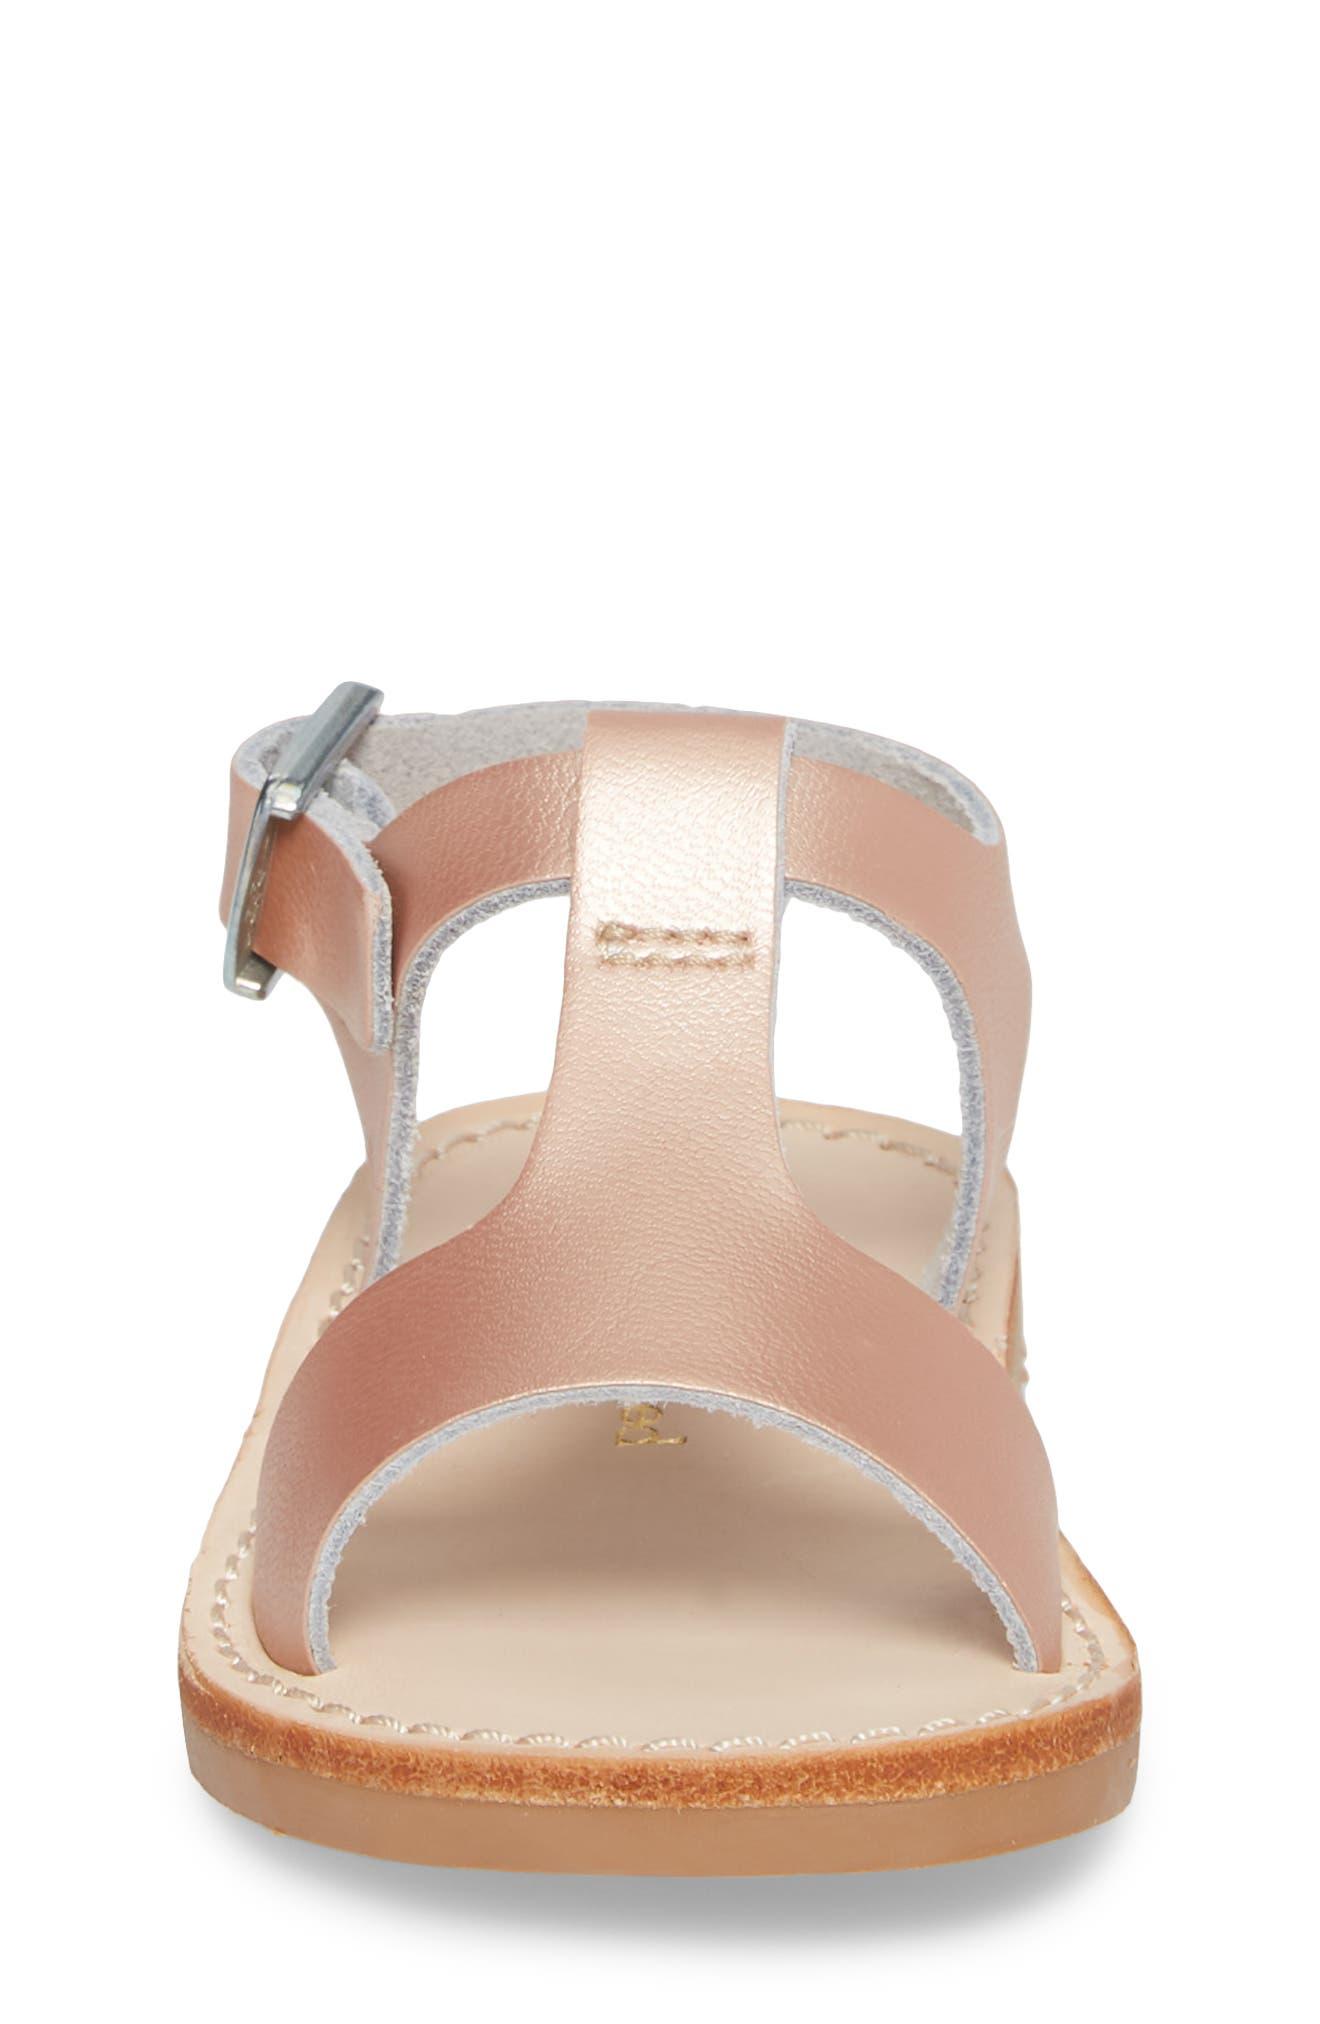 Malibu Water Resistant Sandal,                             Alternate thumbnail 4, color,                             220